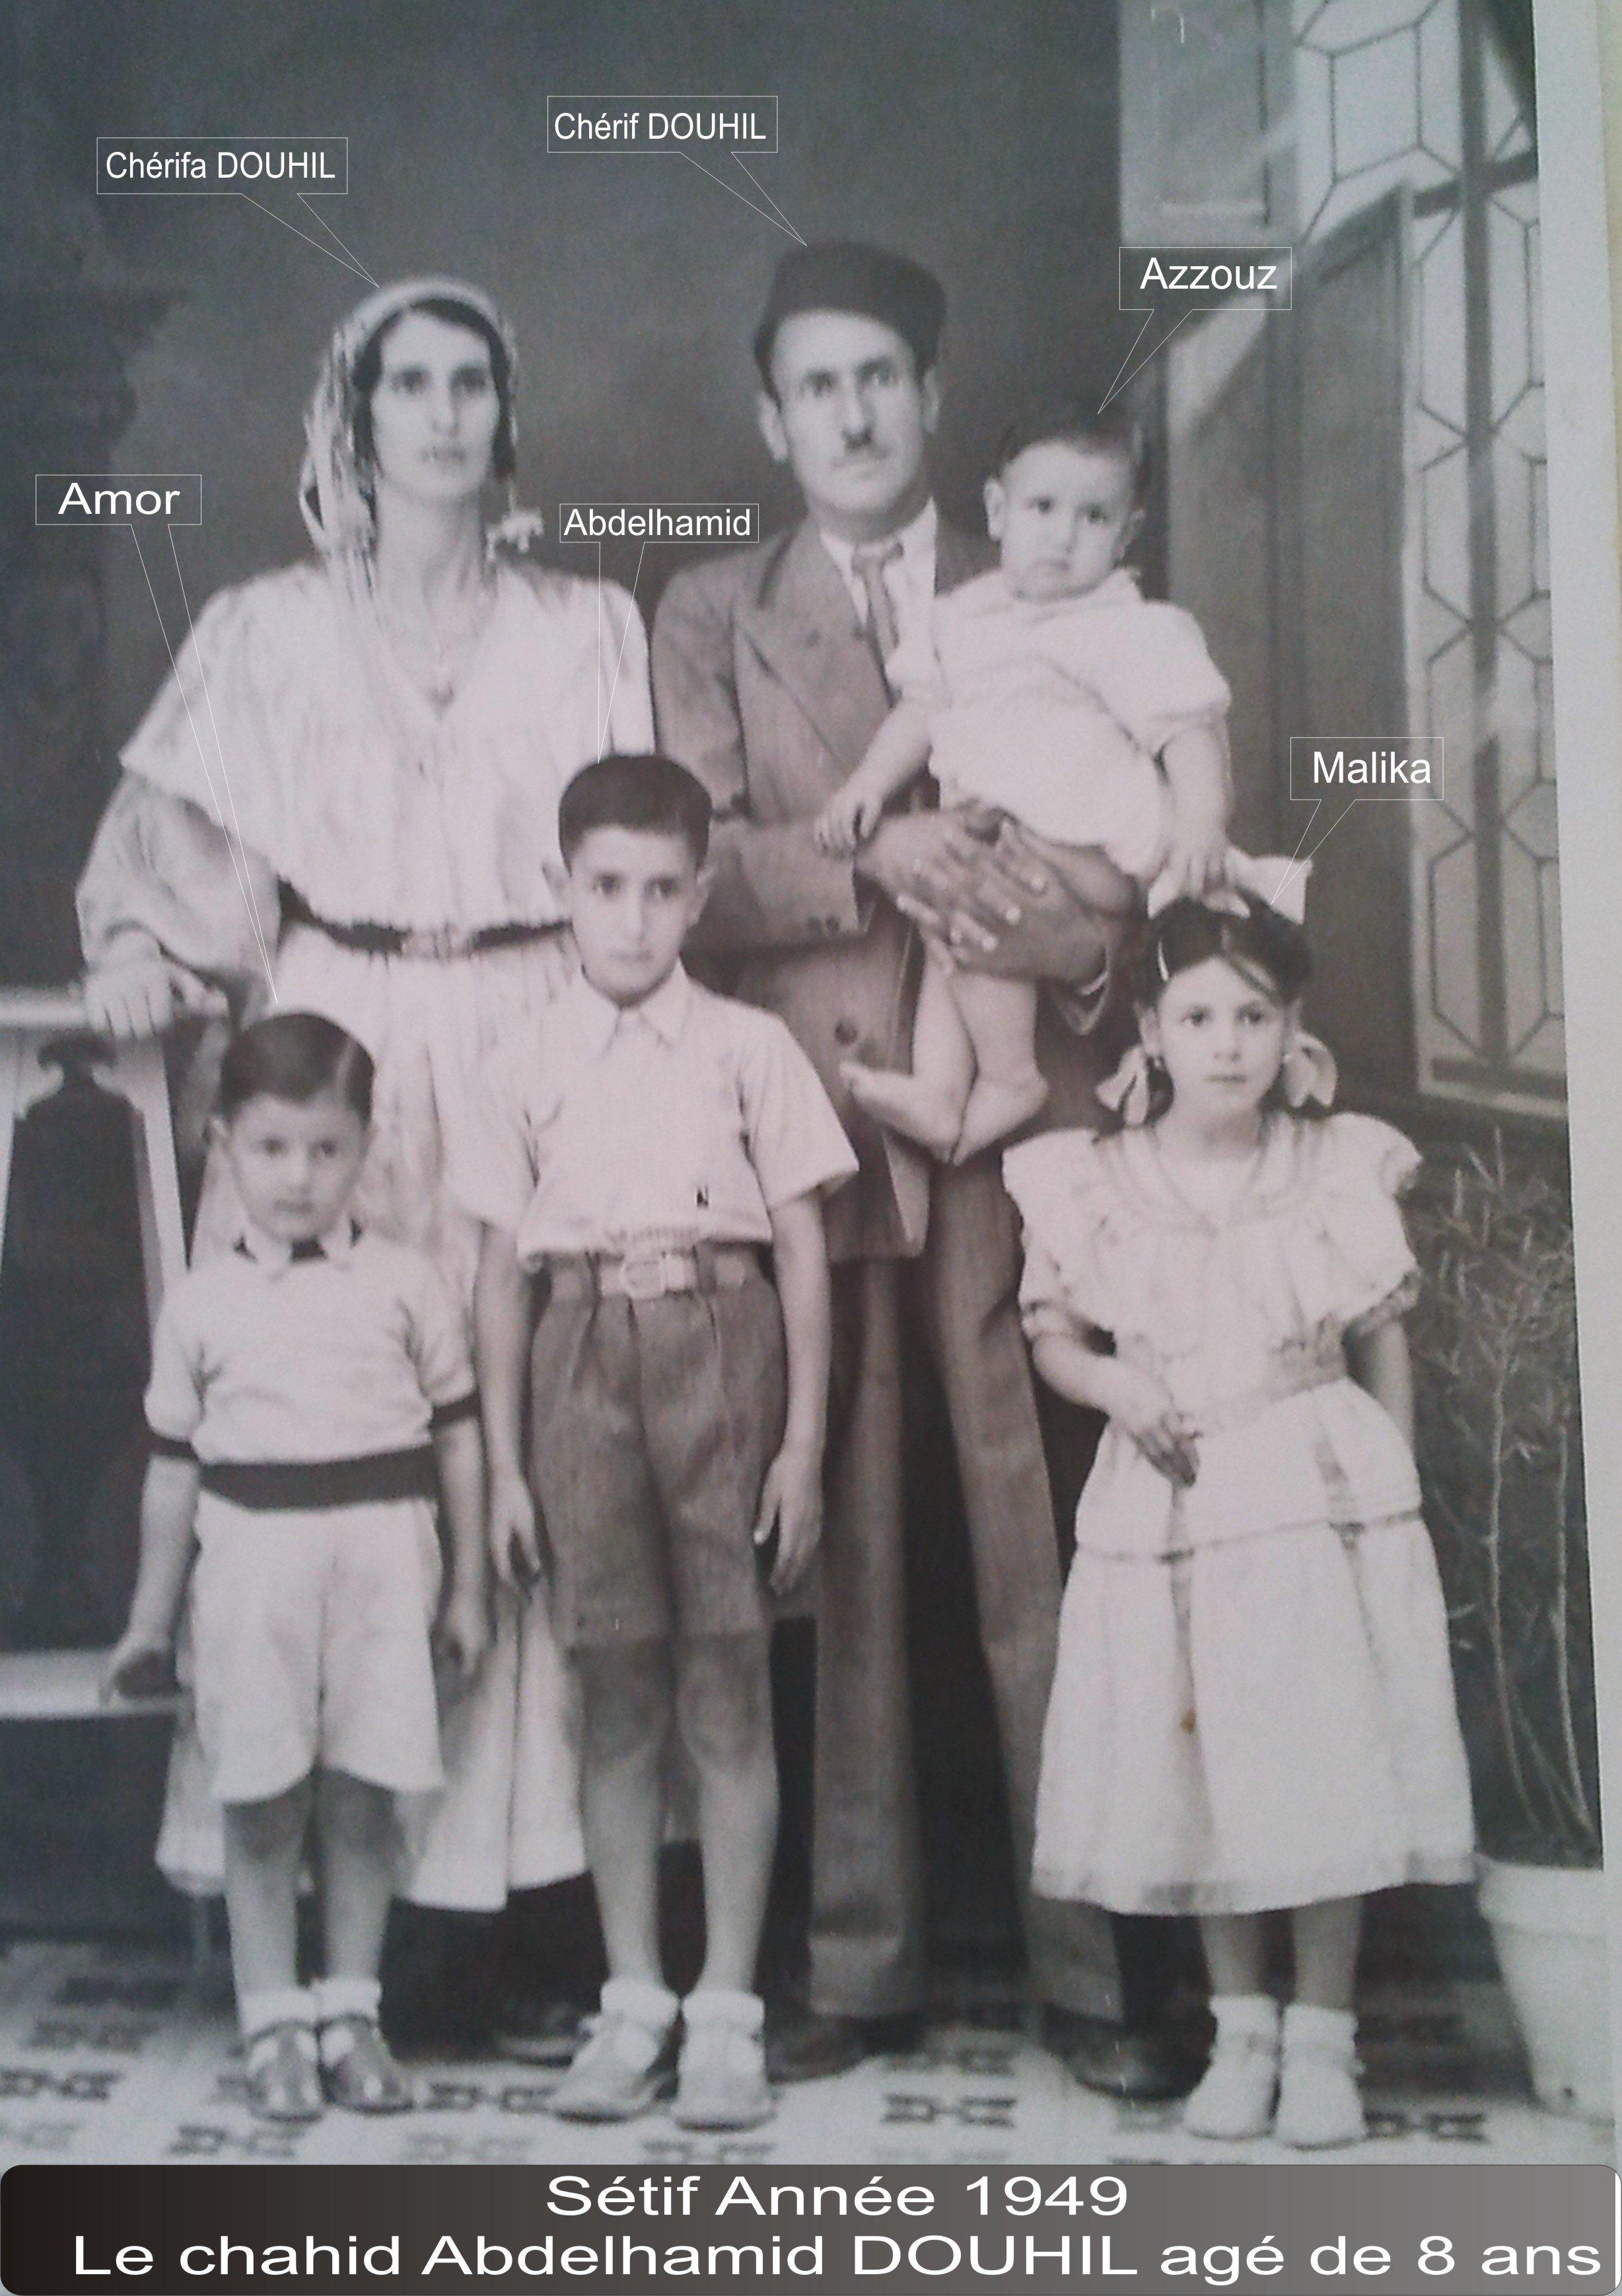 222-206x300 FAMILLE-DOUHIL-CHERIF-ANNEE-19491-211x300